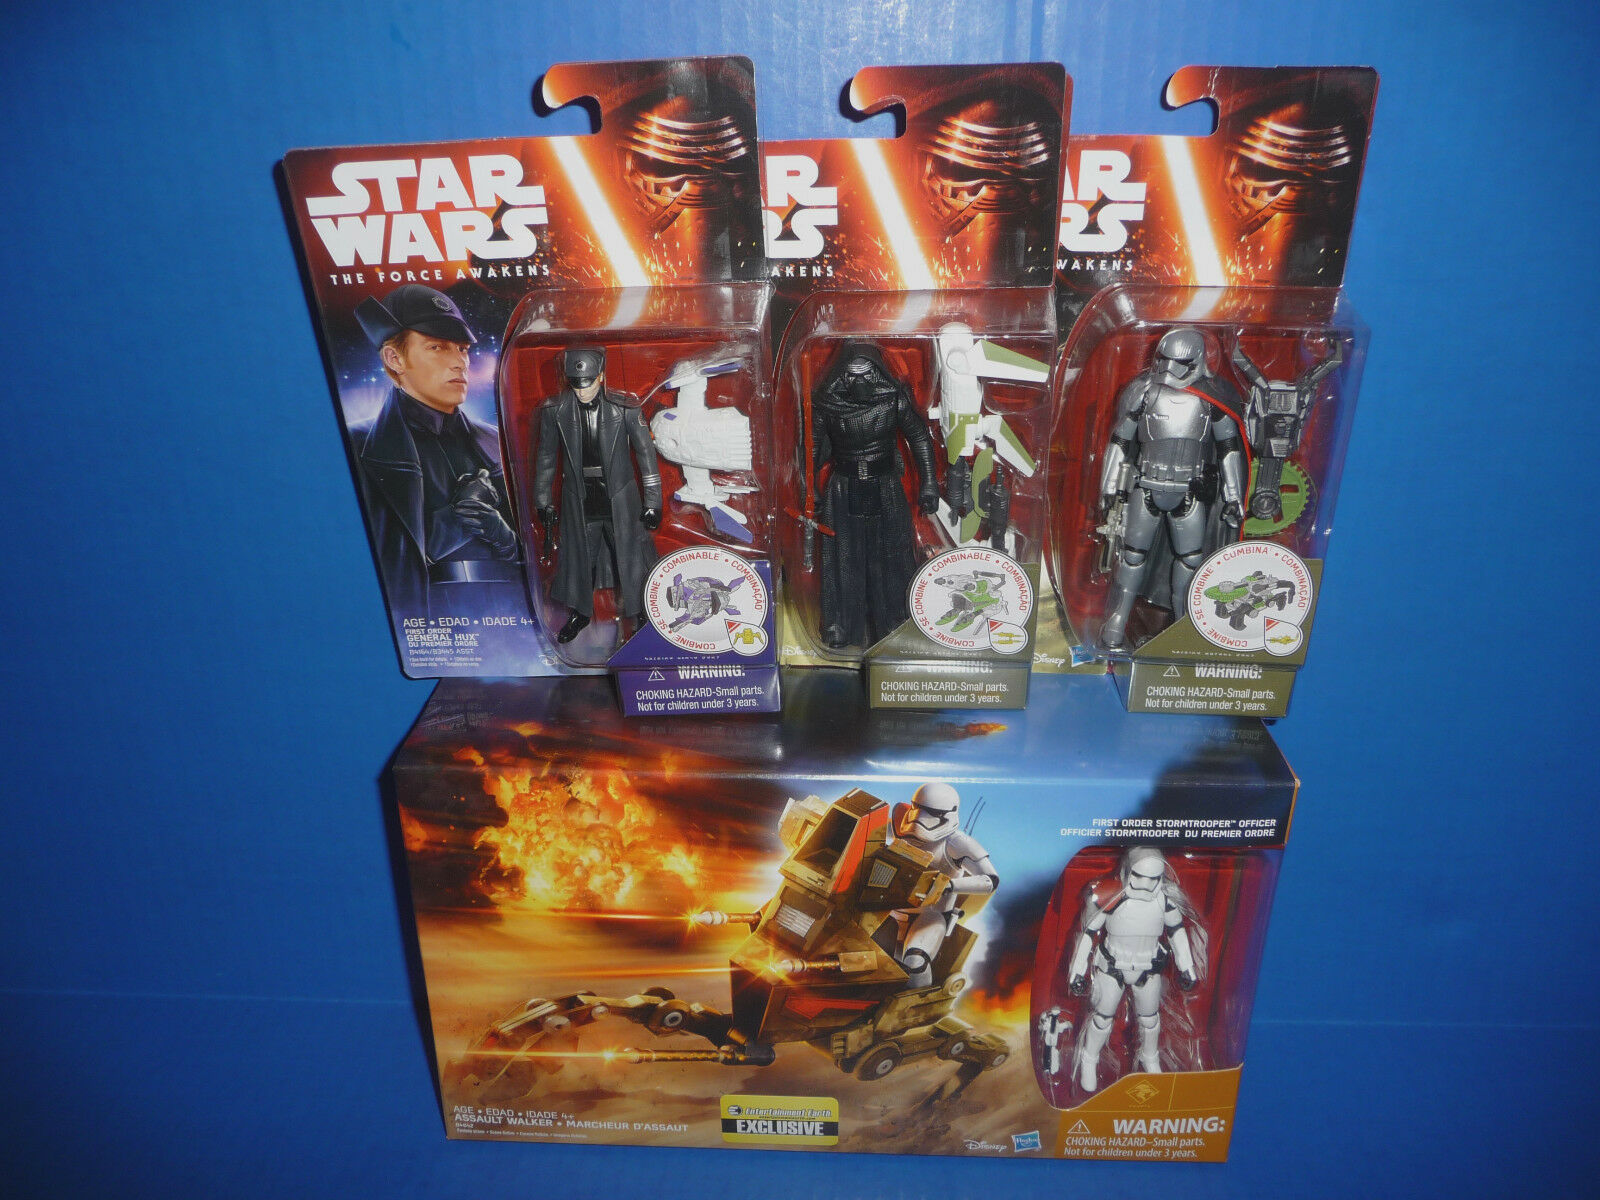 Star Wars The Force Awakens Figures-Kylo Ren, Capt. Phasma, Hux + Assault Walker